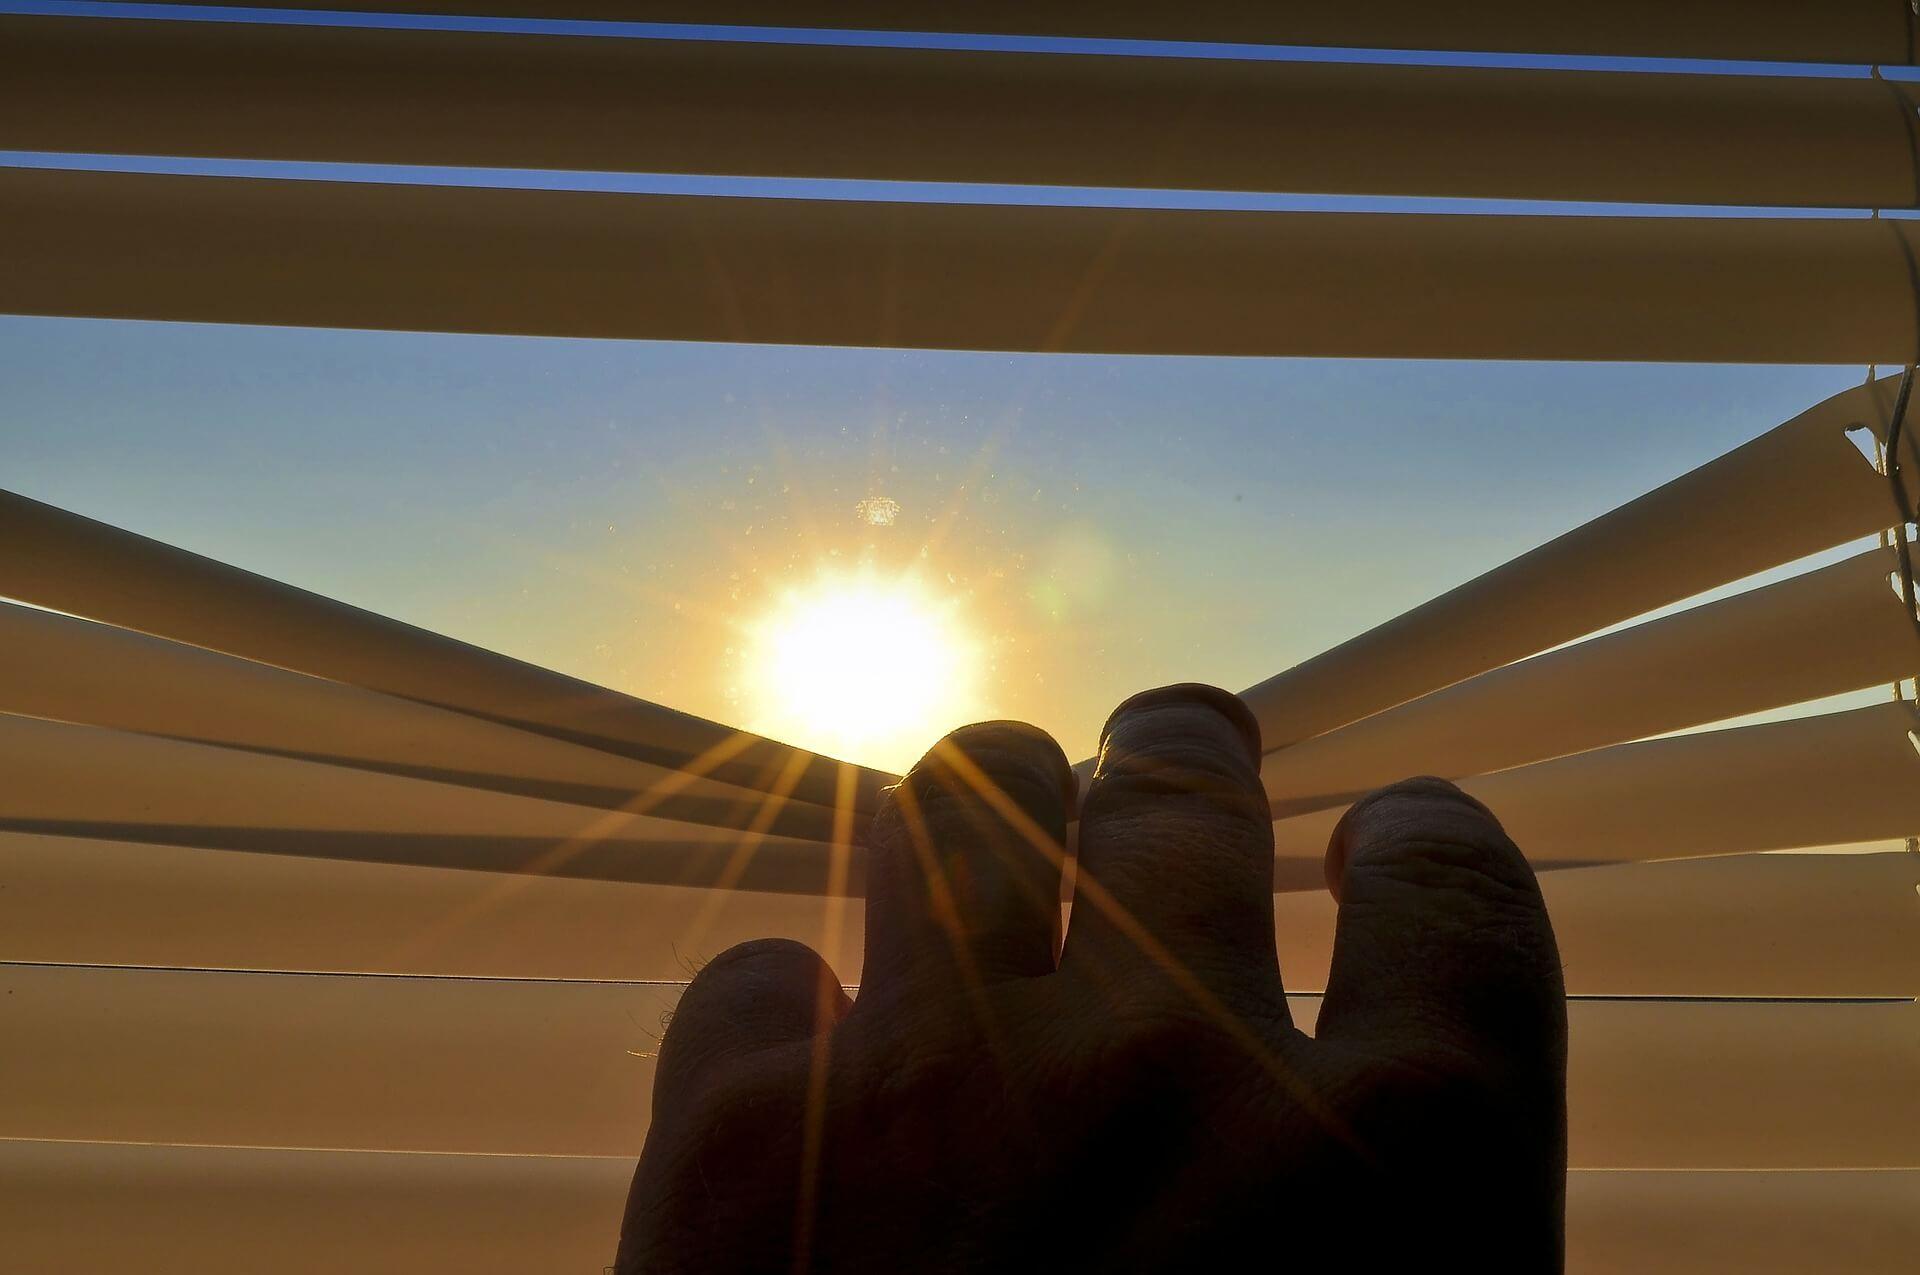 blinds-201173_1920